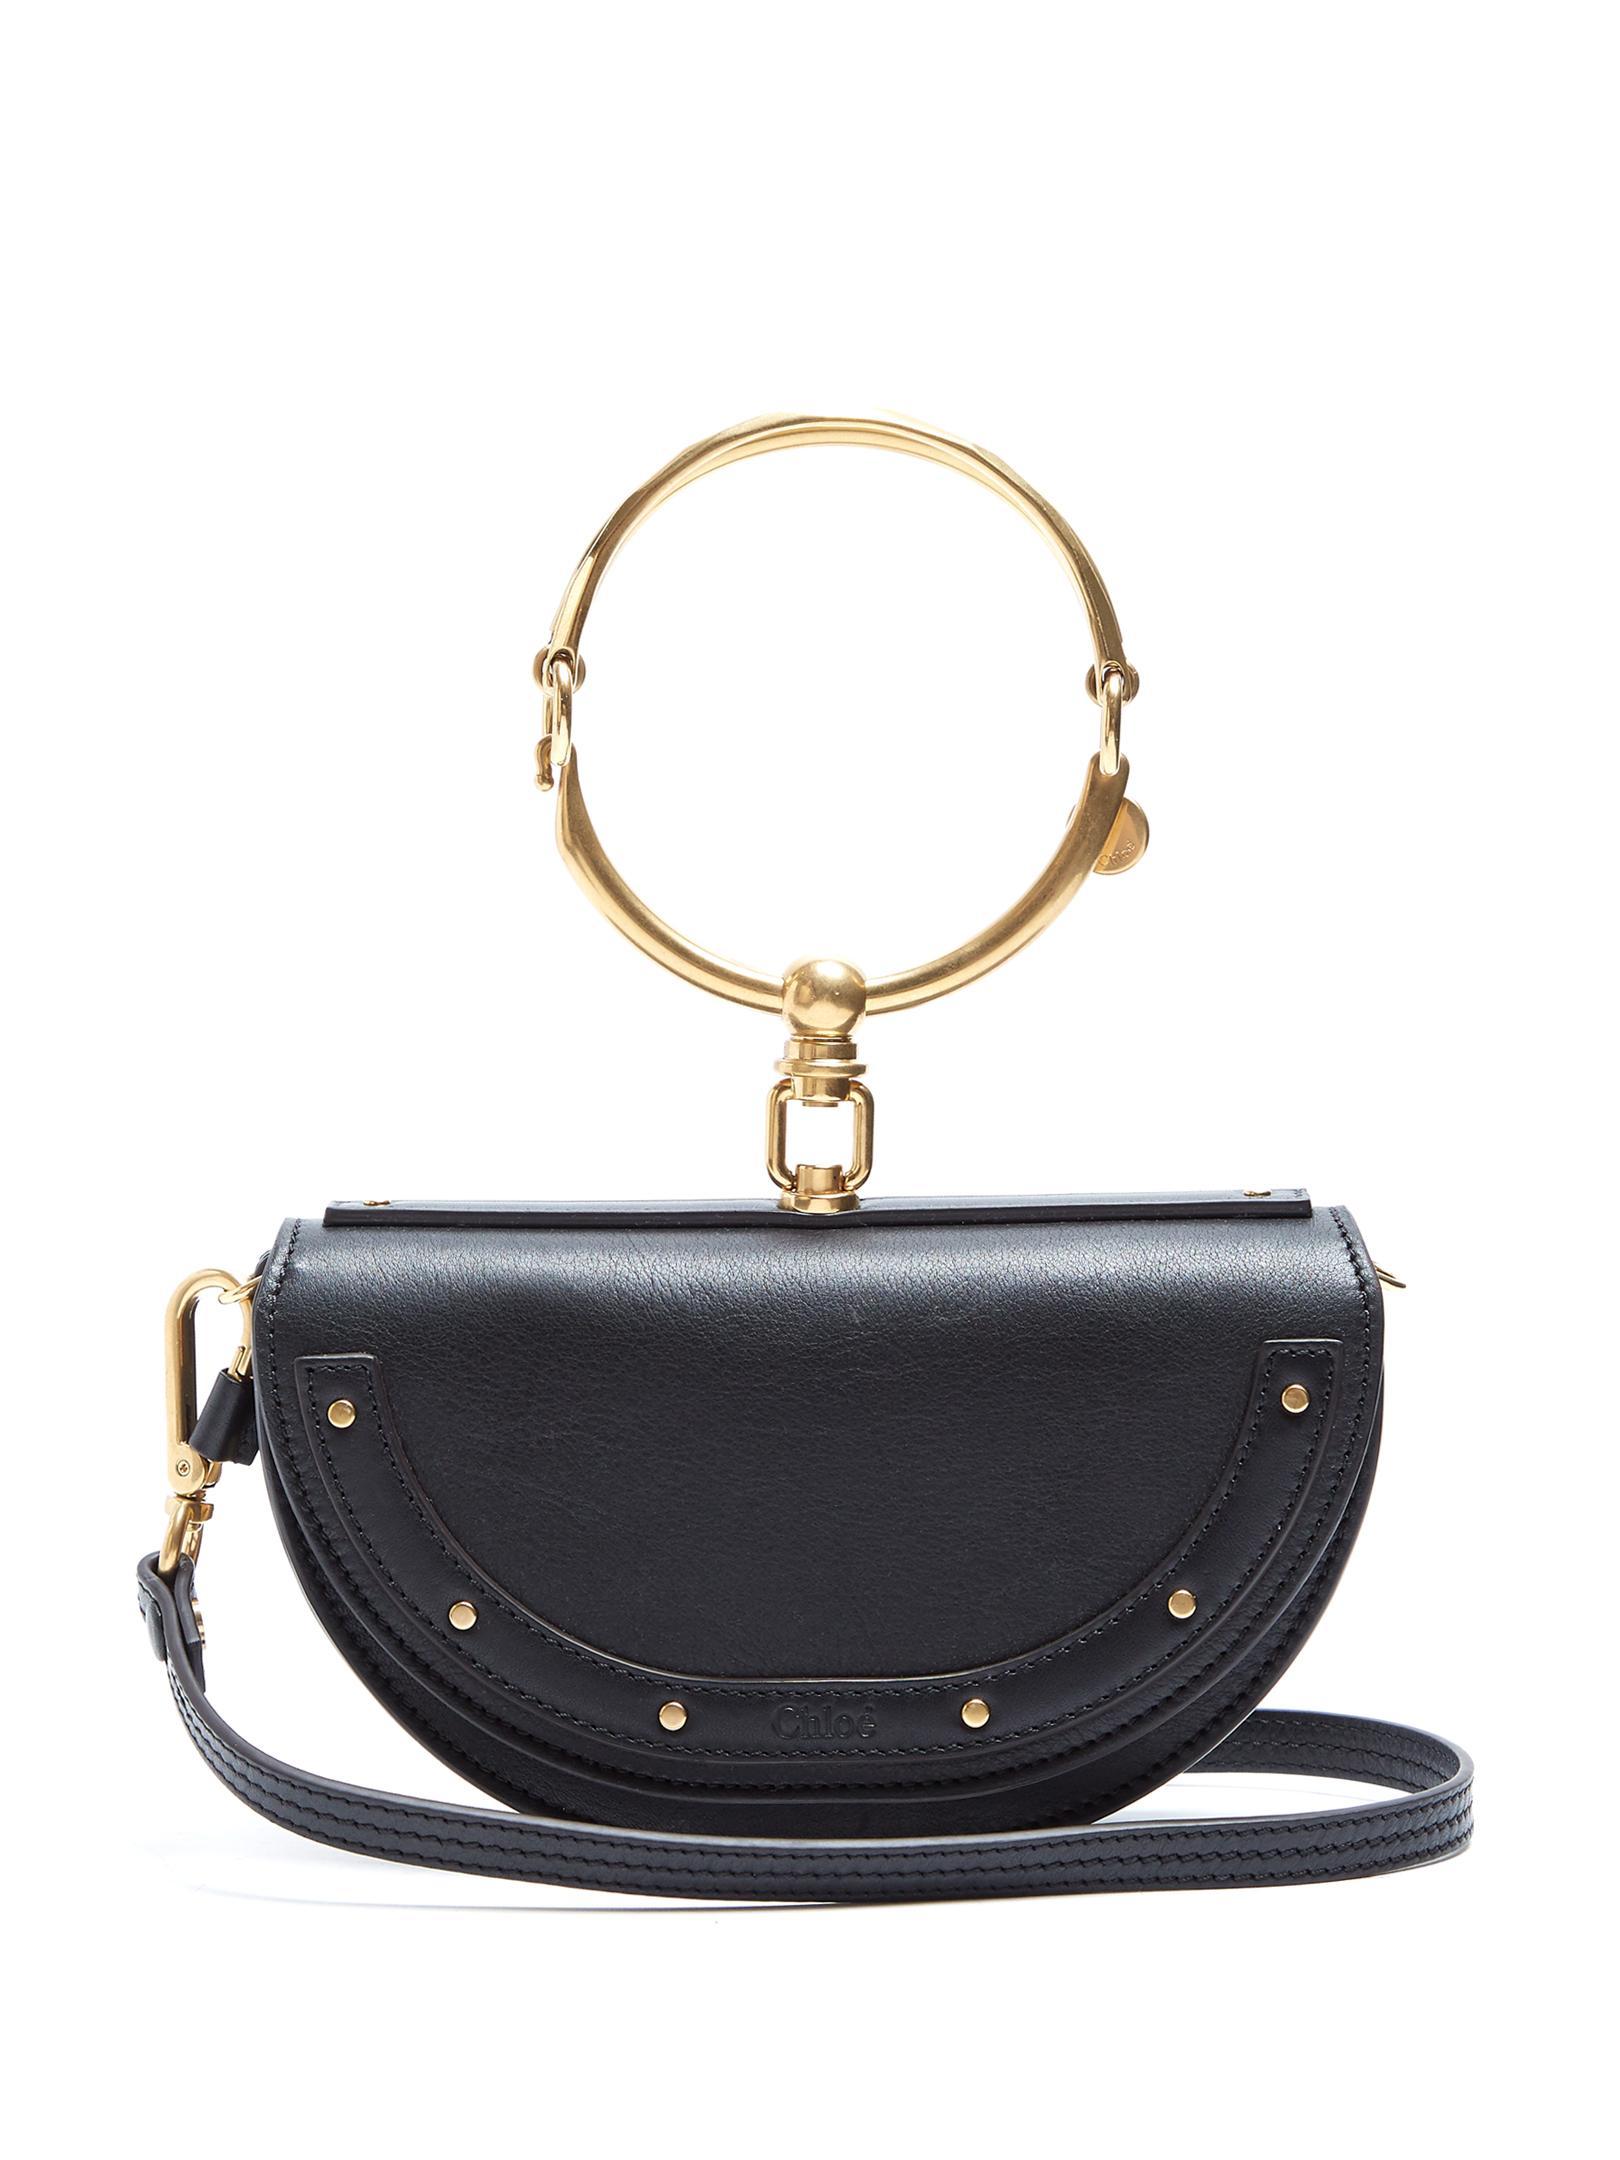 19f6fb39 Chloé Black Nile Minaudière Small Cross-body Bag